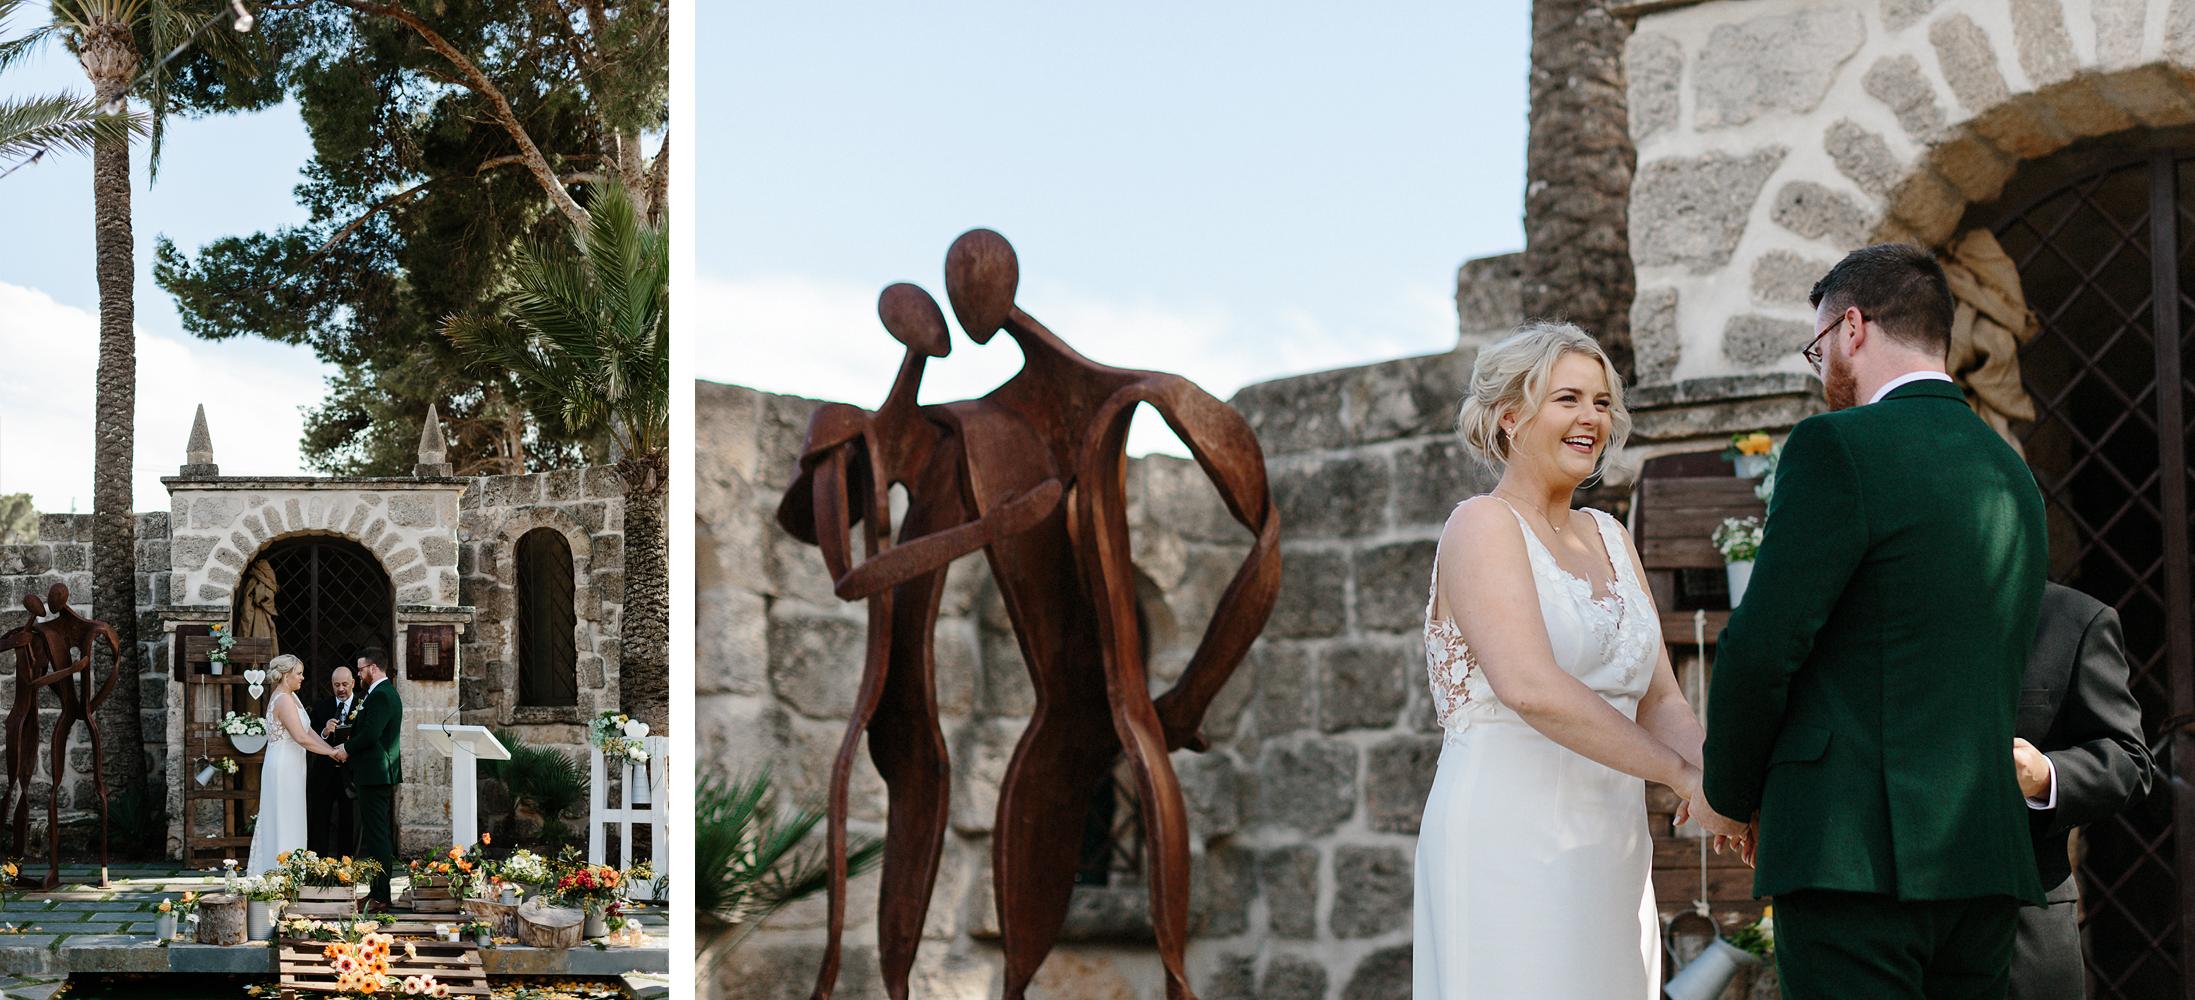 spread-23-european-wedding-photographer-destination-wedding-photographer-from-toronto-ryanne-hollies-photography-documentary-editorial-style-toronto-wedding-photographer-bridal-portrait-moody-dramatic-romantic-valencia-spain-vintage-bw-ring.jpg